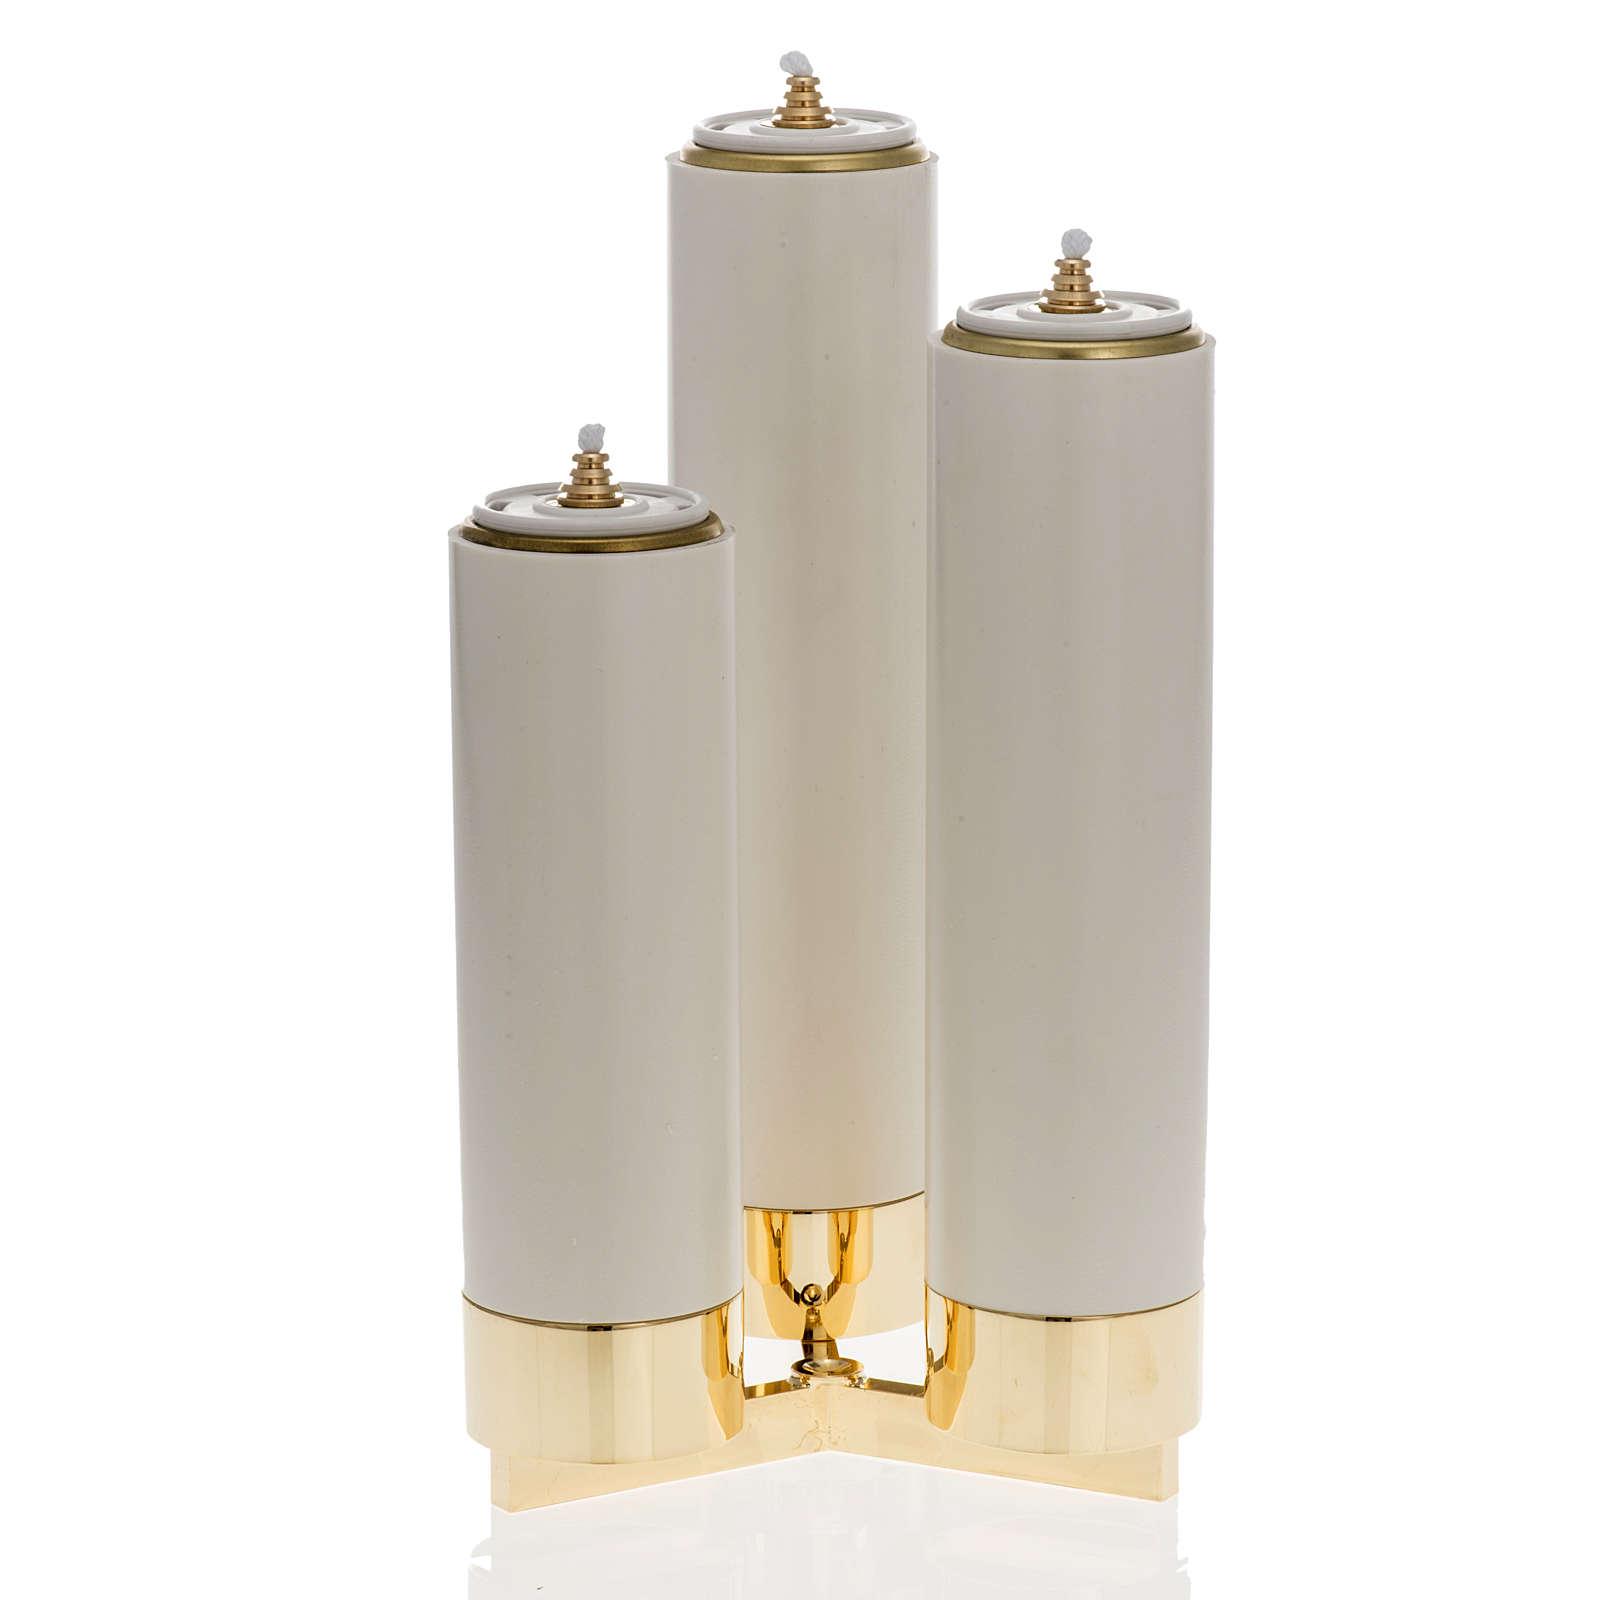 Candeleros de 3 llamas completo velas falsas 4